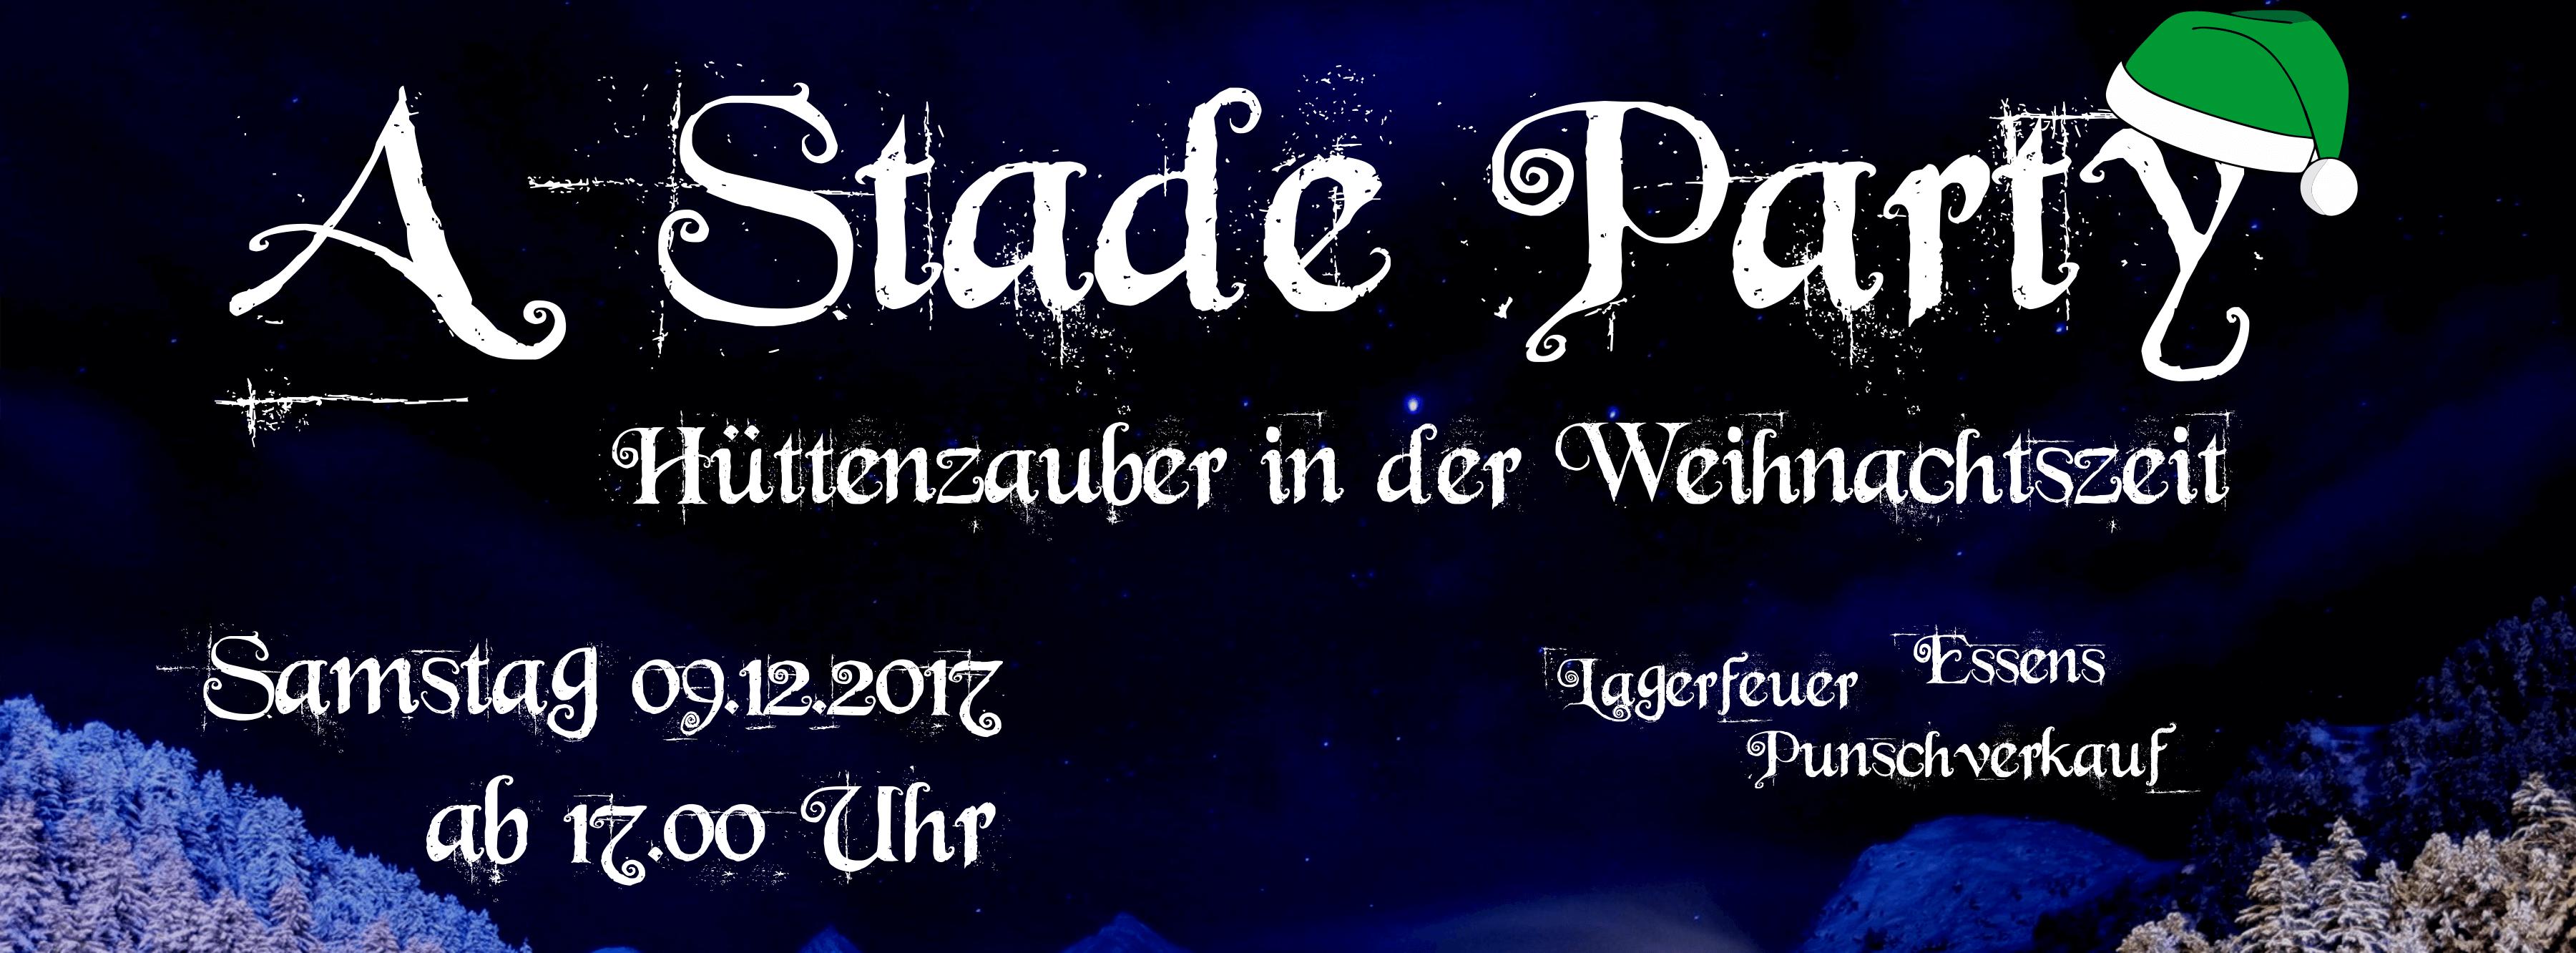 FB A Stade Party